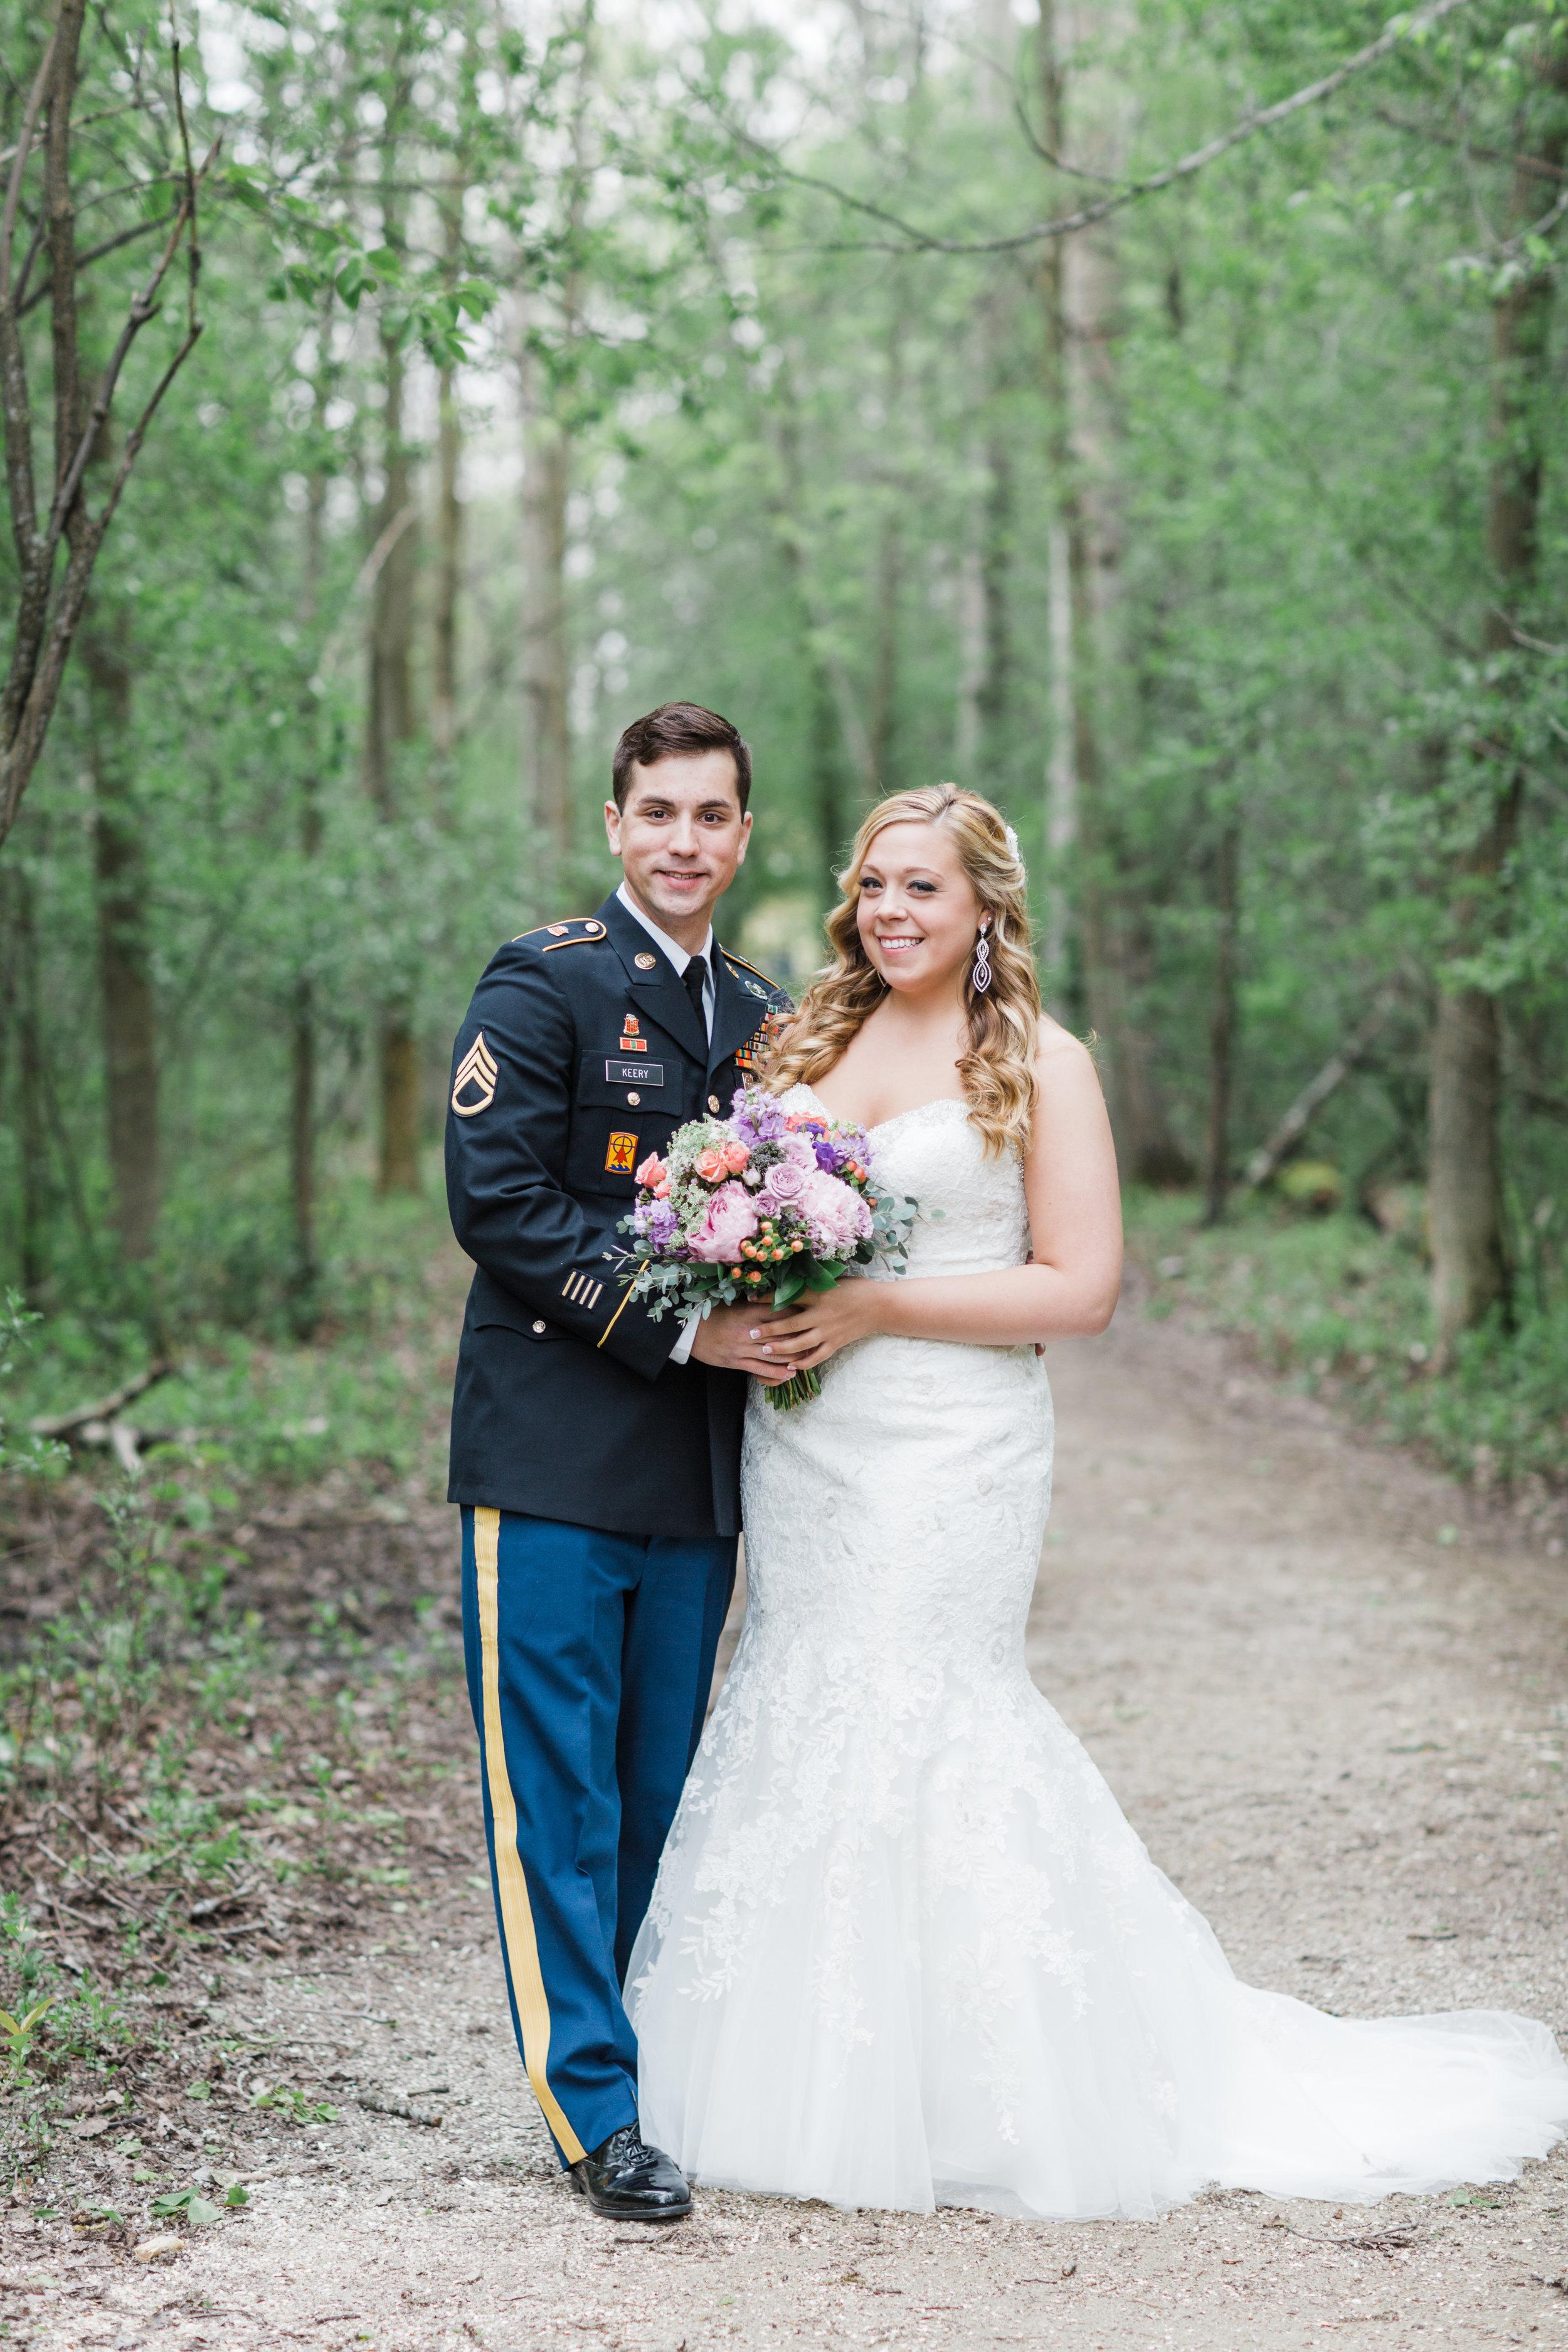 Green Bay Botanical Gardens Wedding Photos, Rock Gardens Reception, Enchanted Florist Wedding Flowers